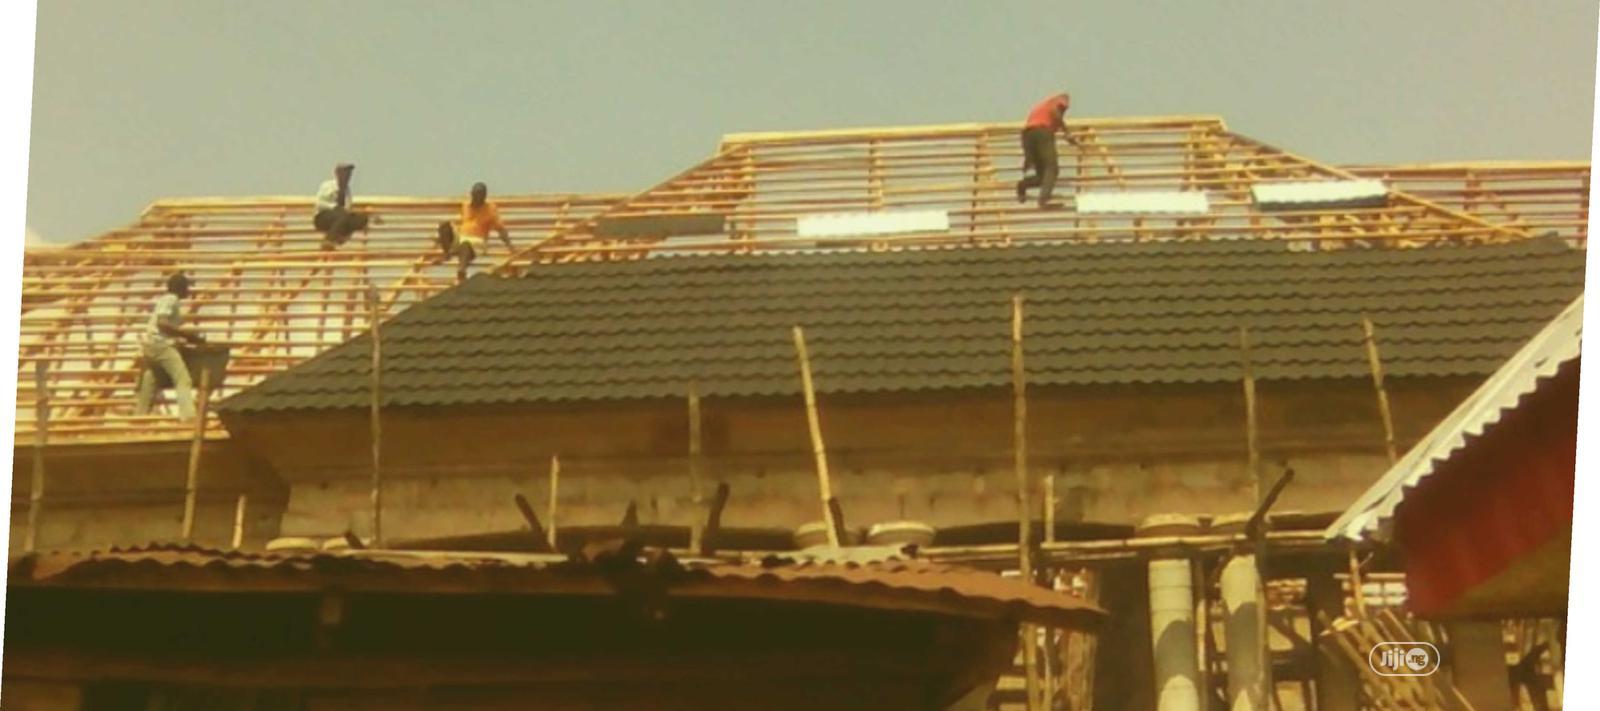 Classic Original Gerard Metro Roofing Tiles & Rain Gutter